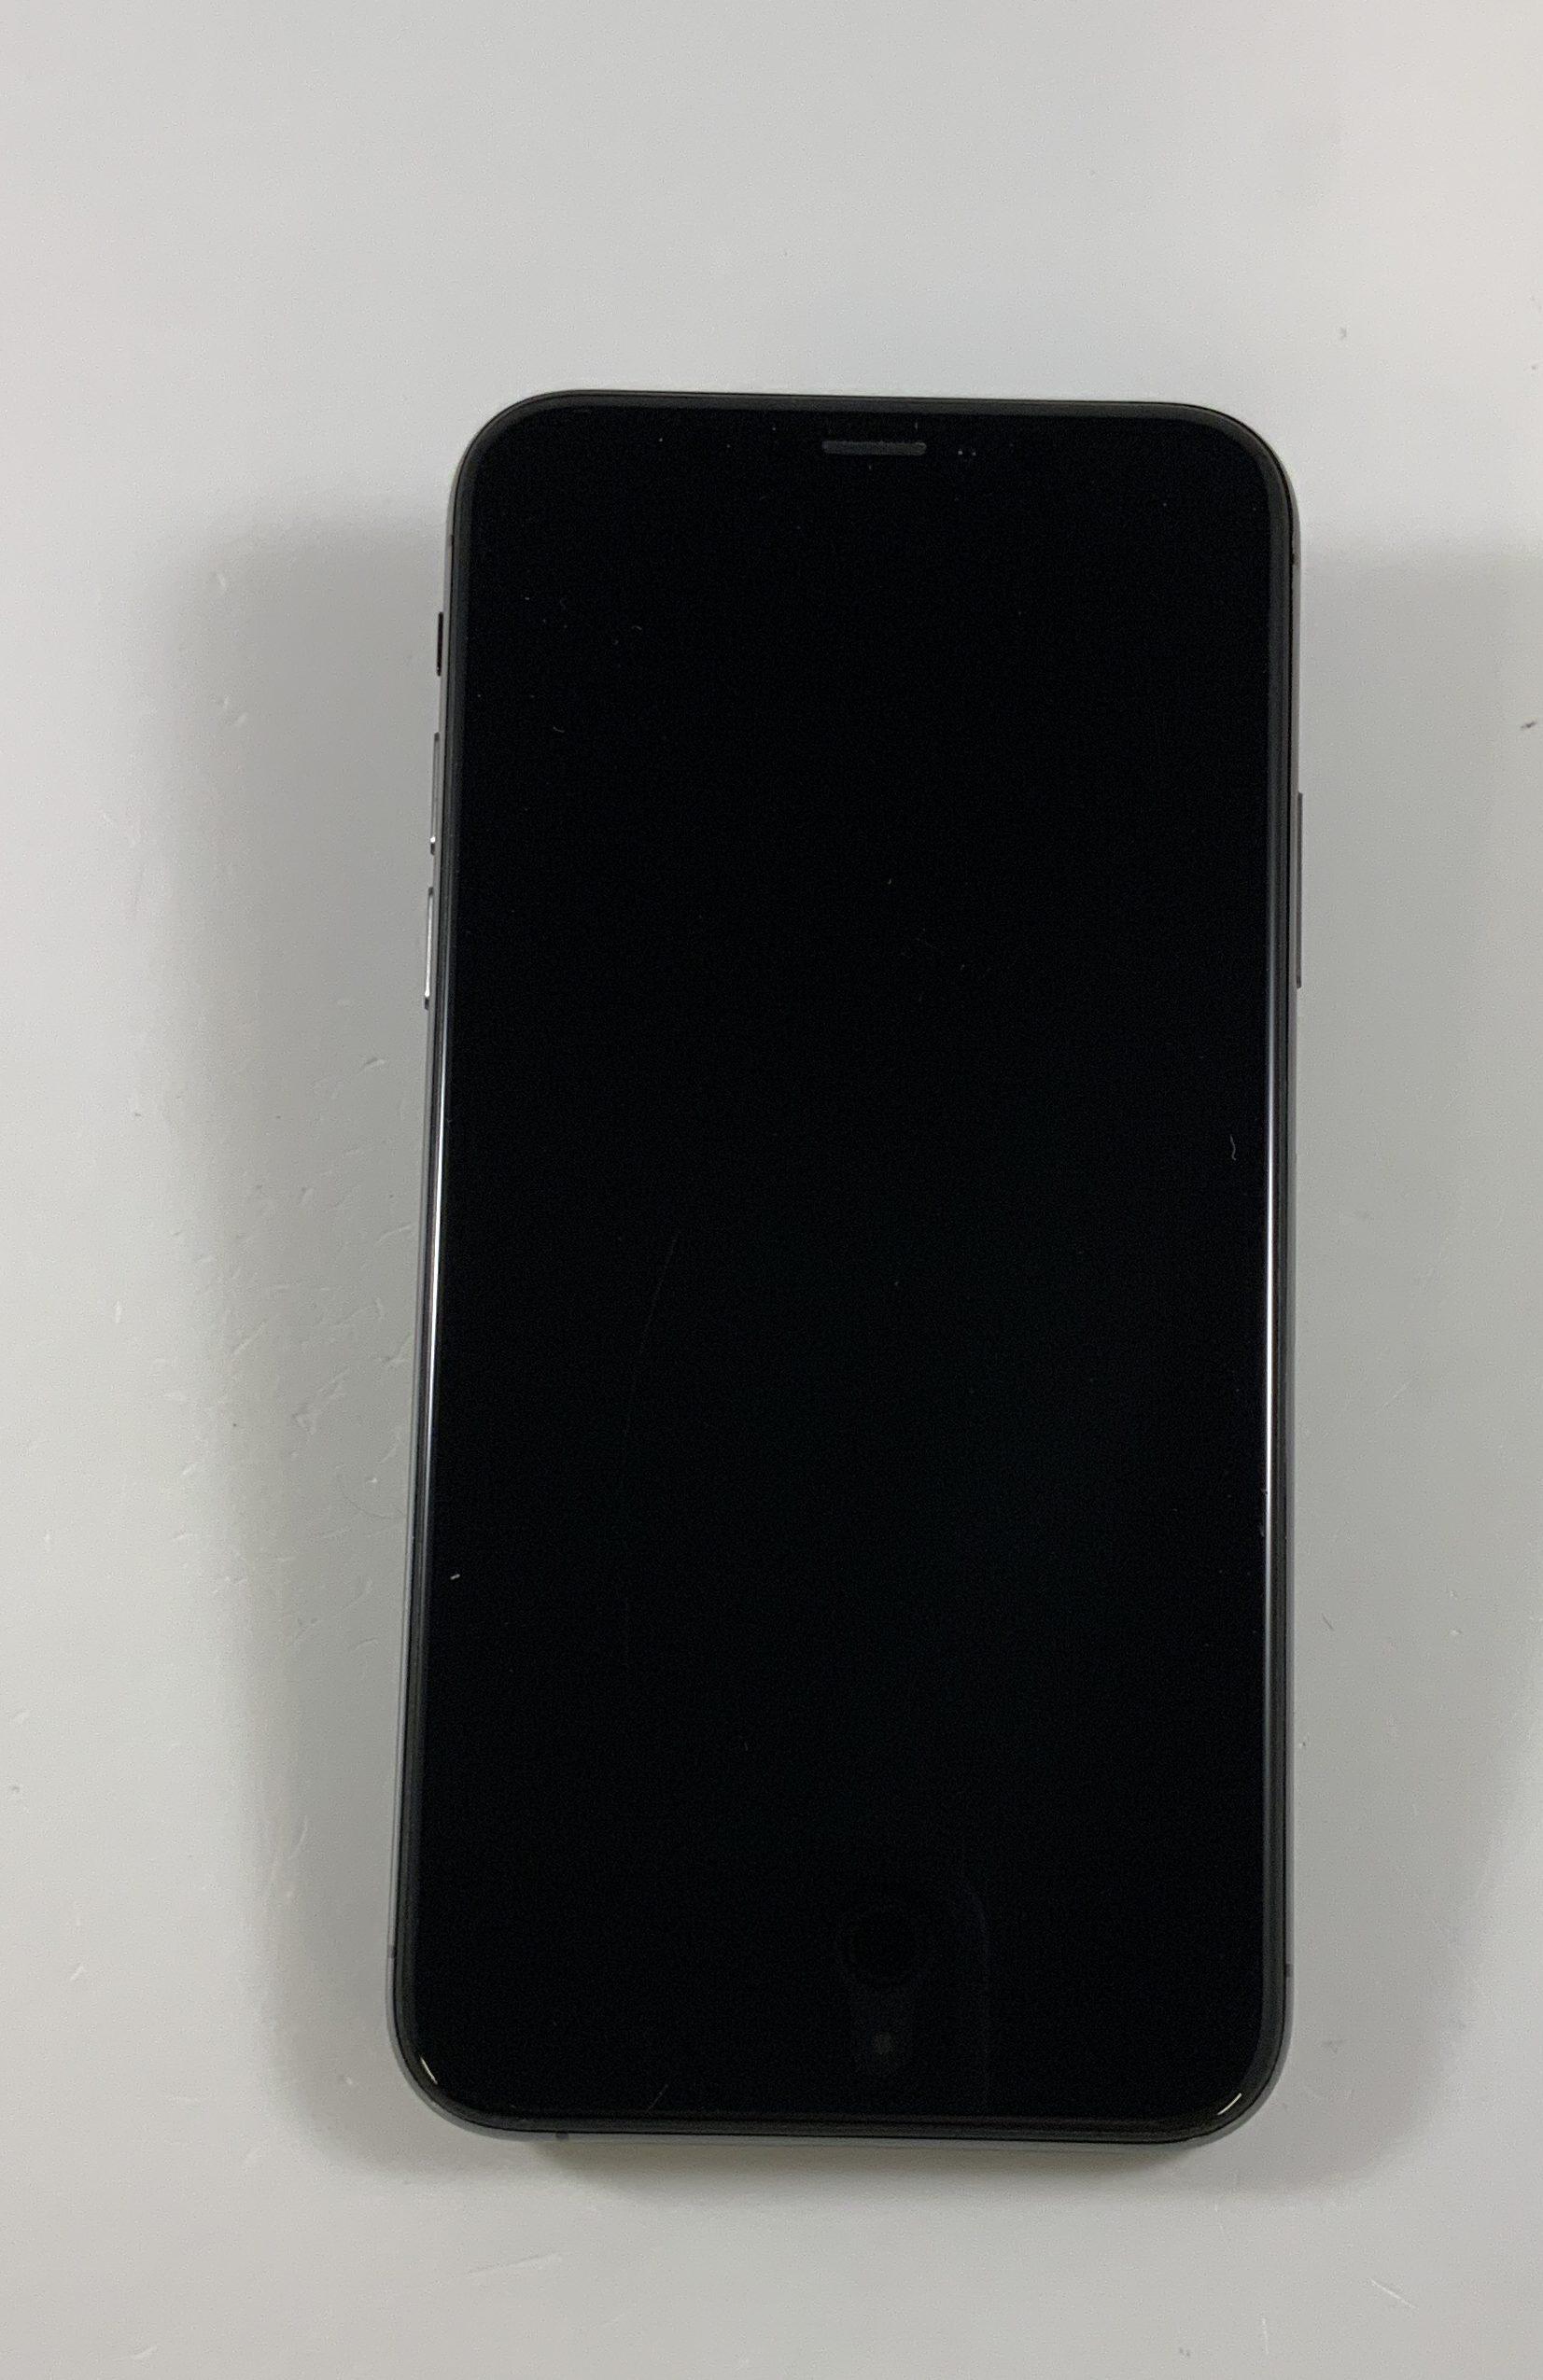 iPhone XS 64GB, 64GB, Space Gray, Afbeelding 1